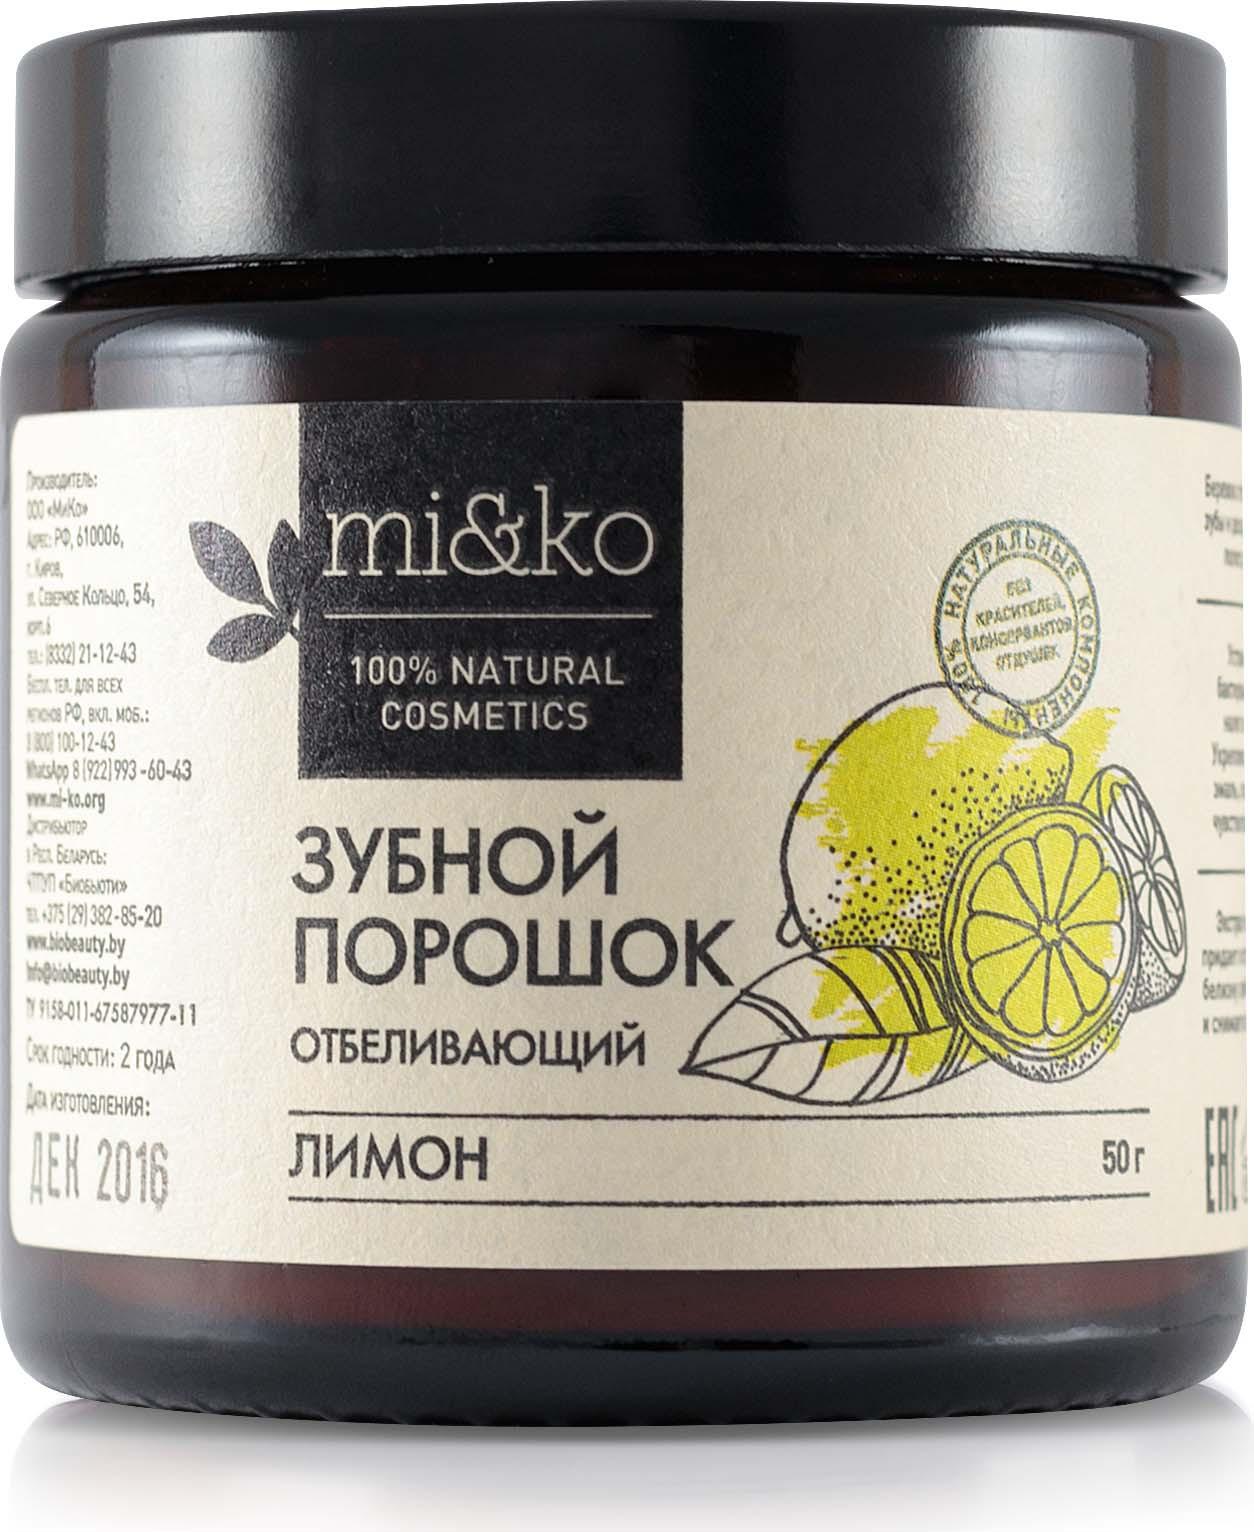 "Зубной порошок Mi&Ko ""Лимон"", отбеливающий, 50 г"